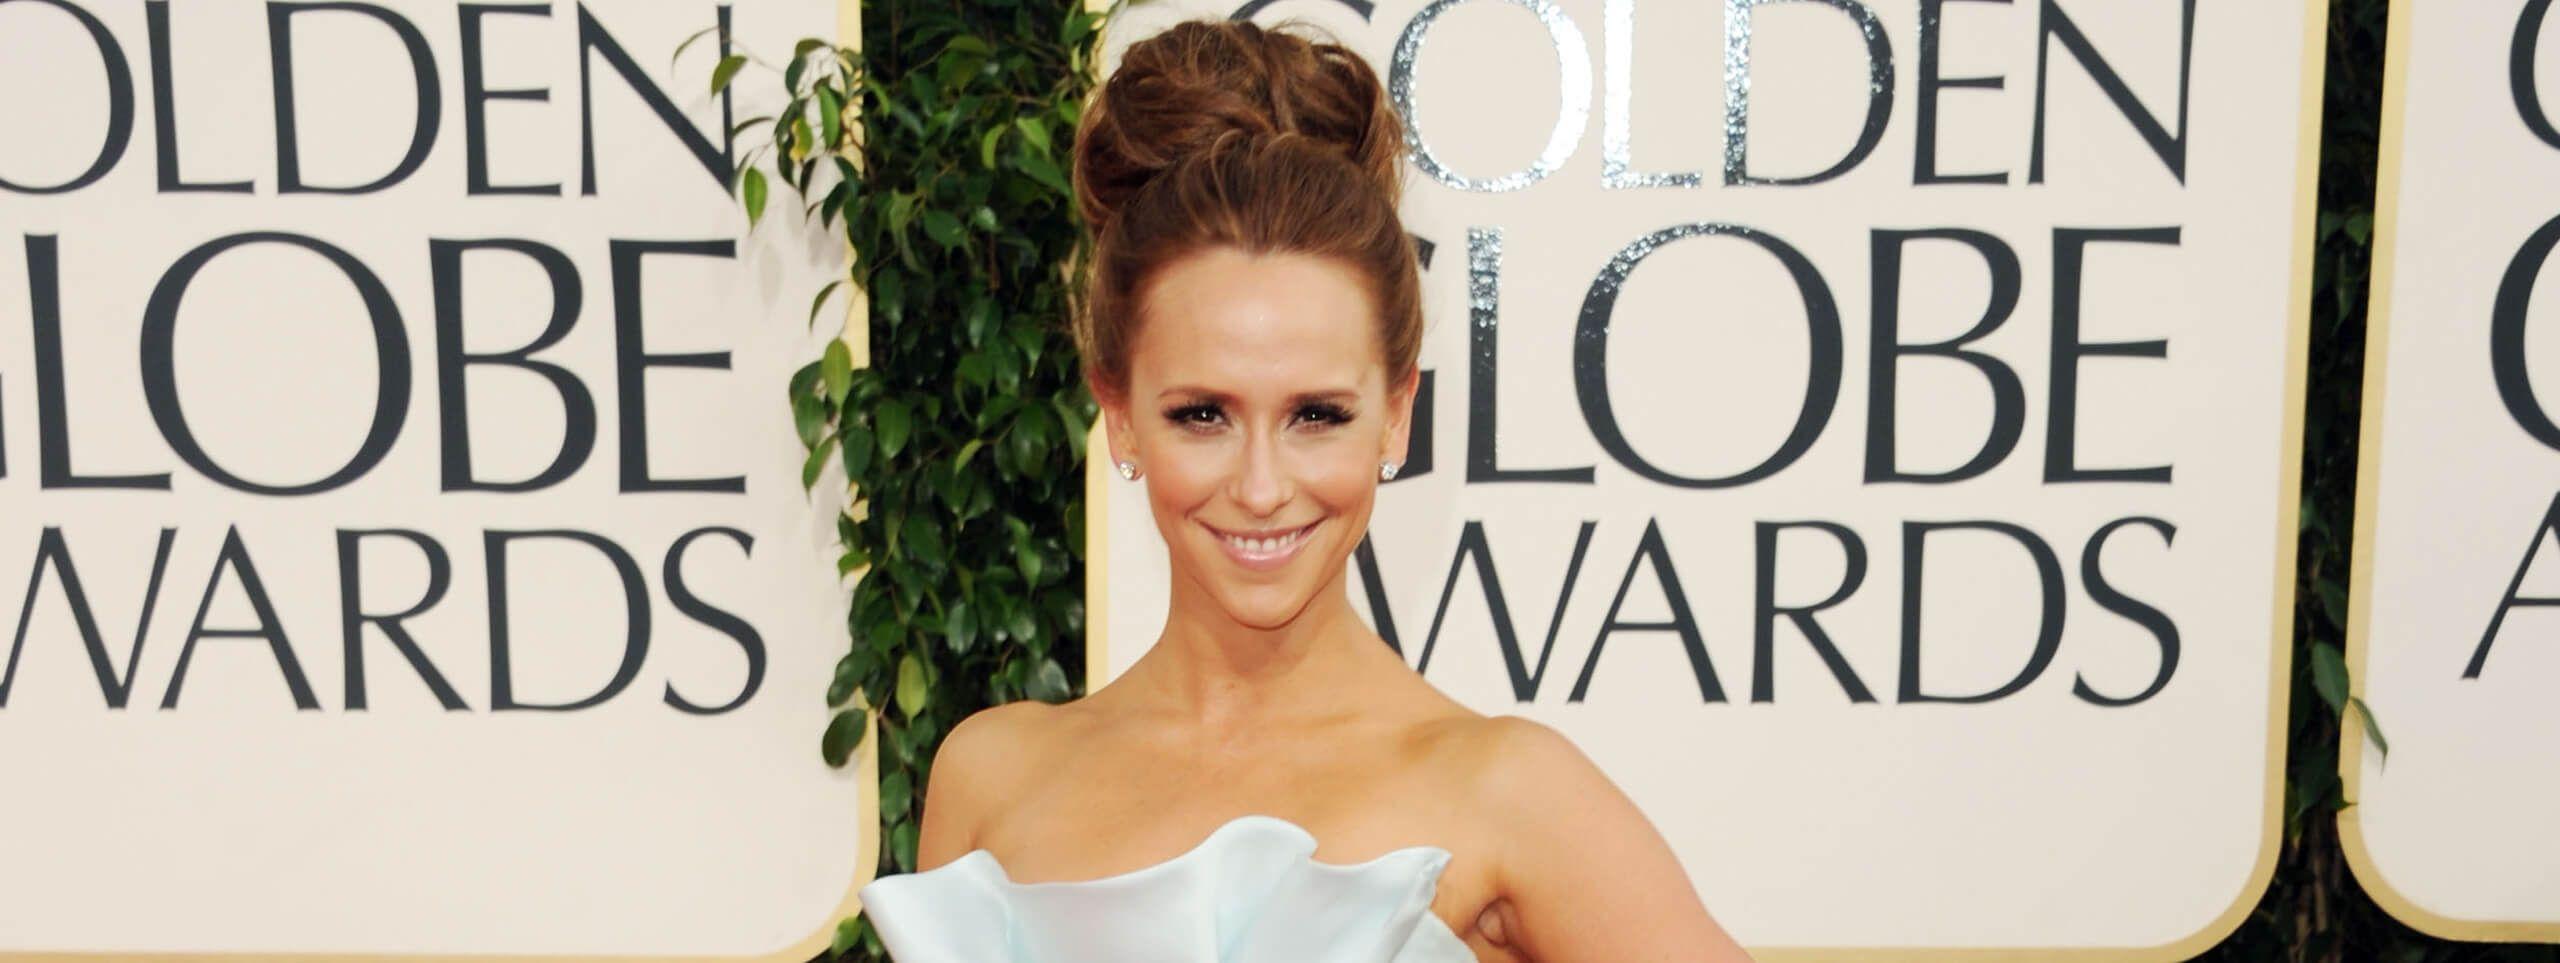 Jennifer Love-Hewitt wears classic chignon hairstyle